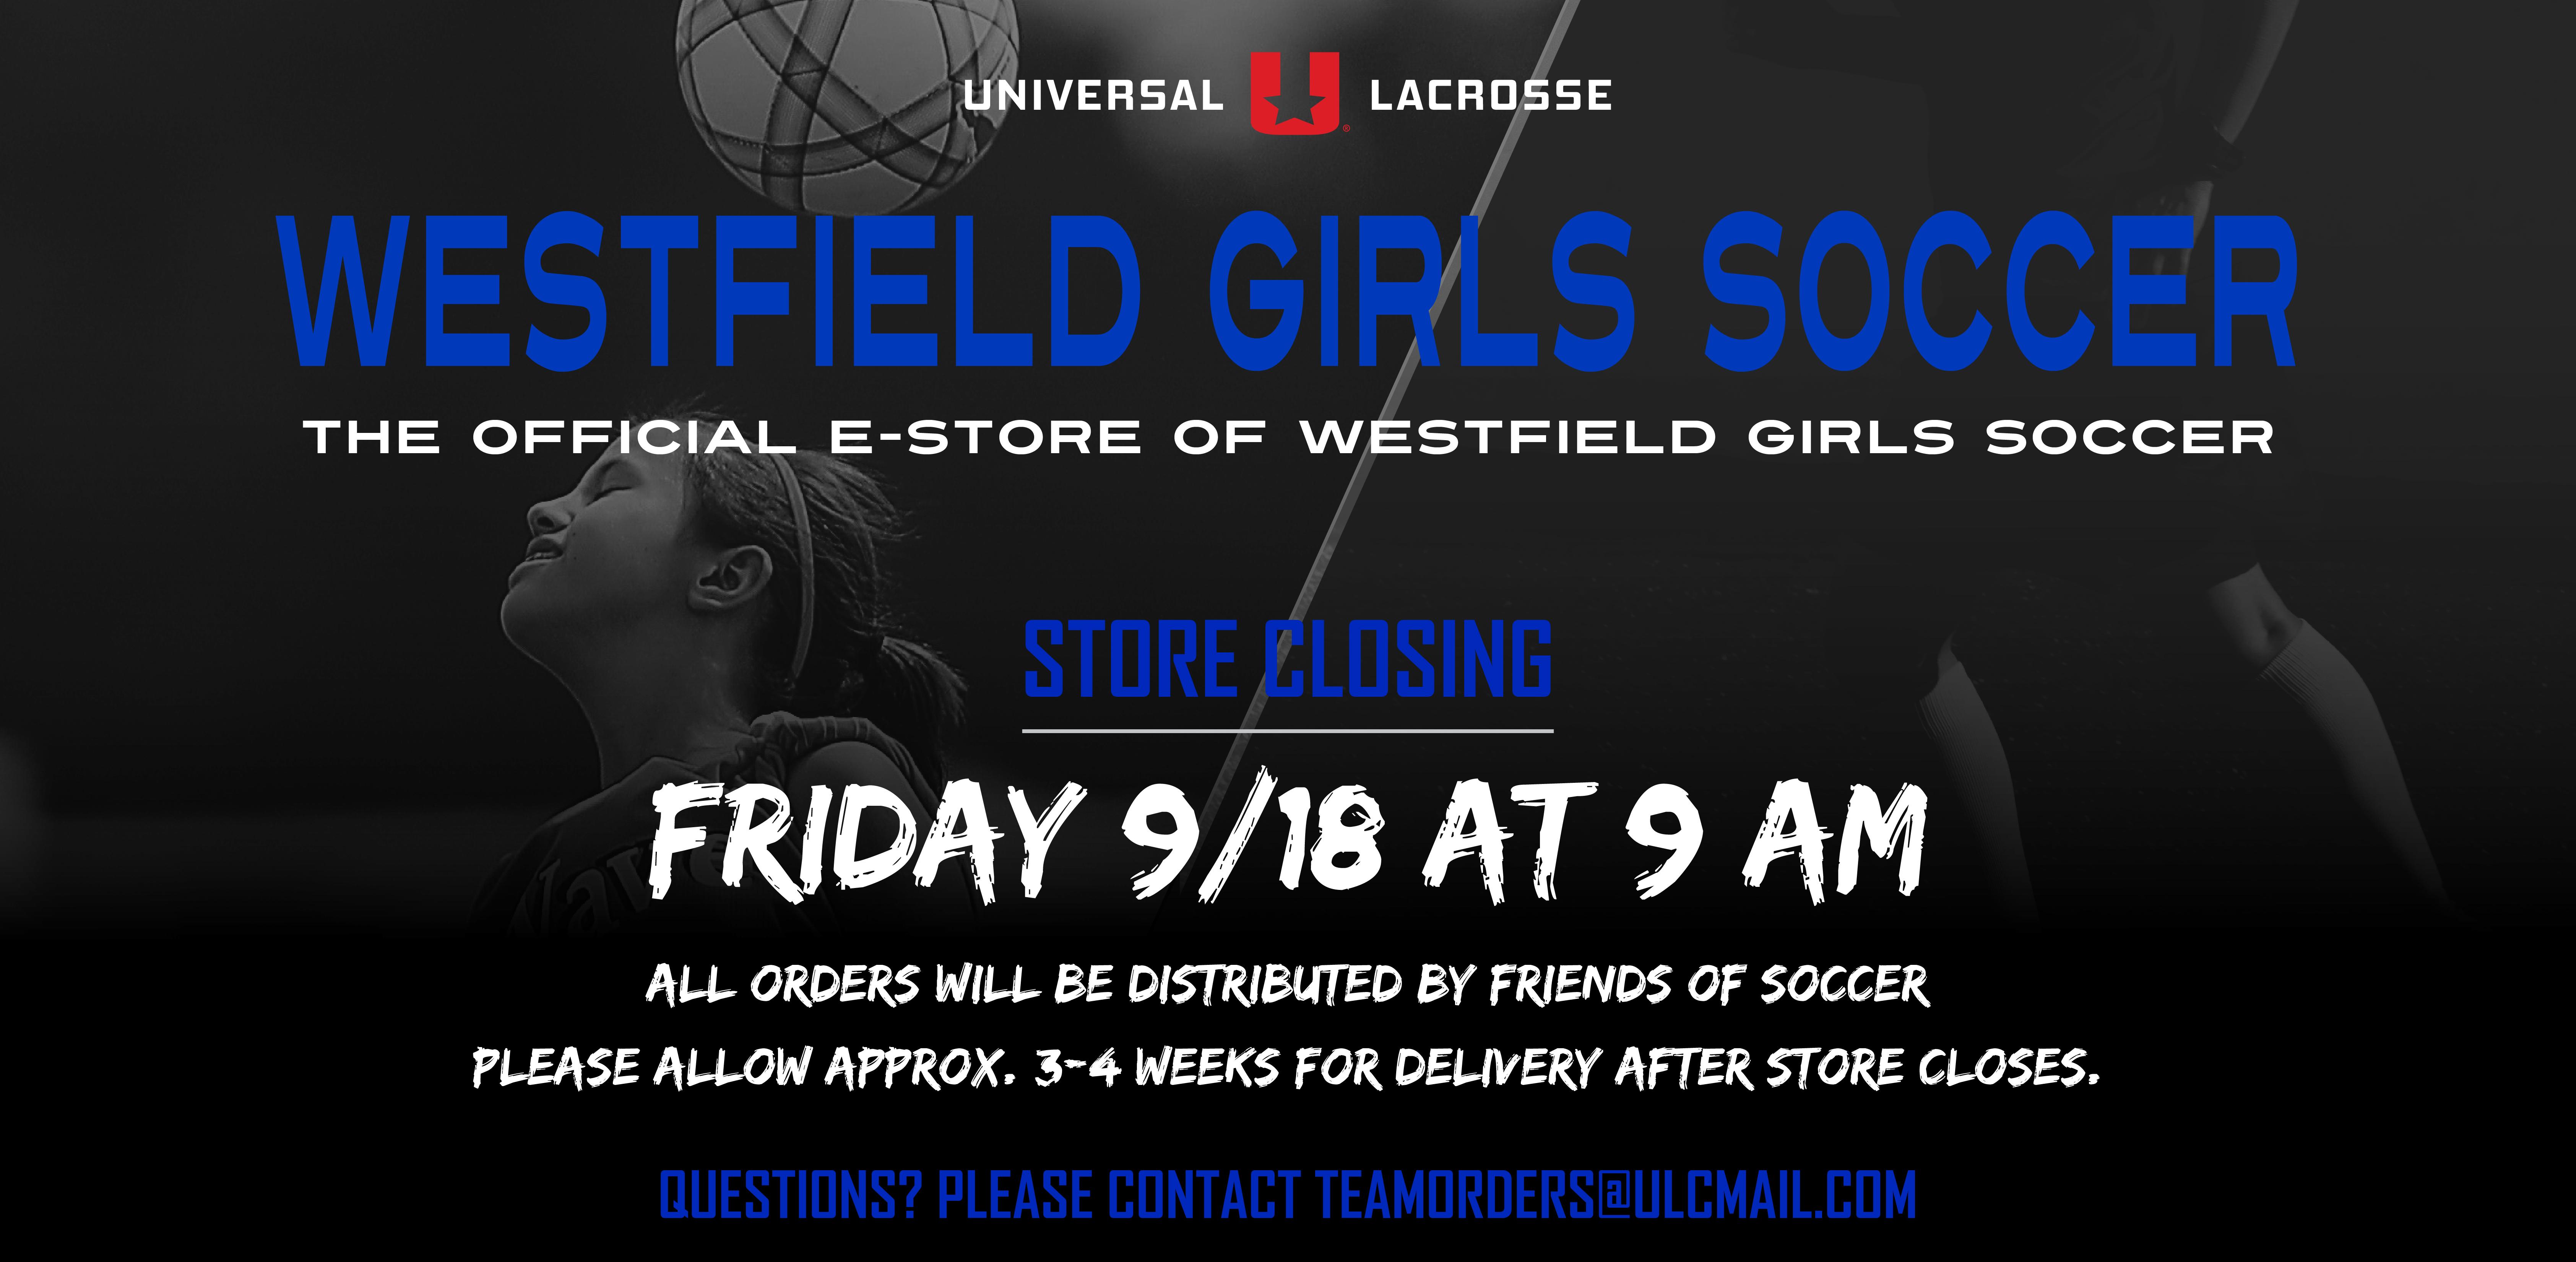 Westfield Girls Soccer